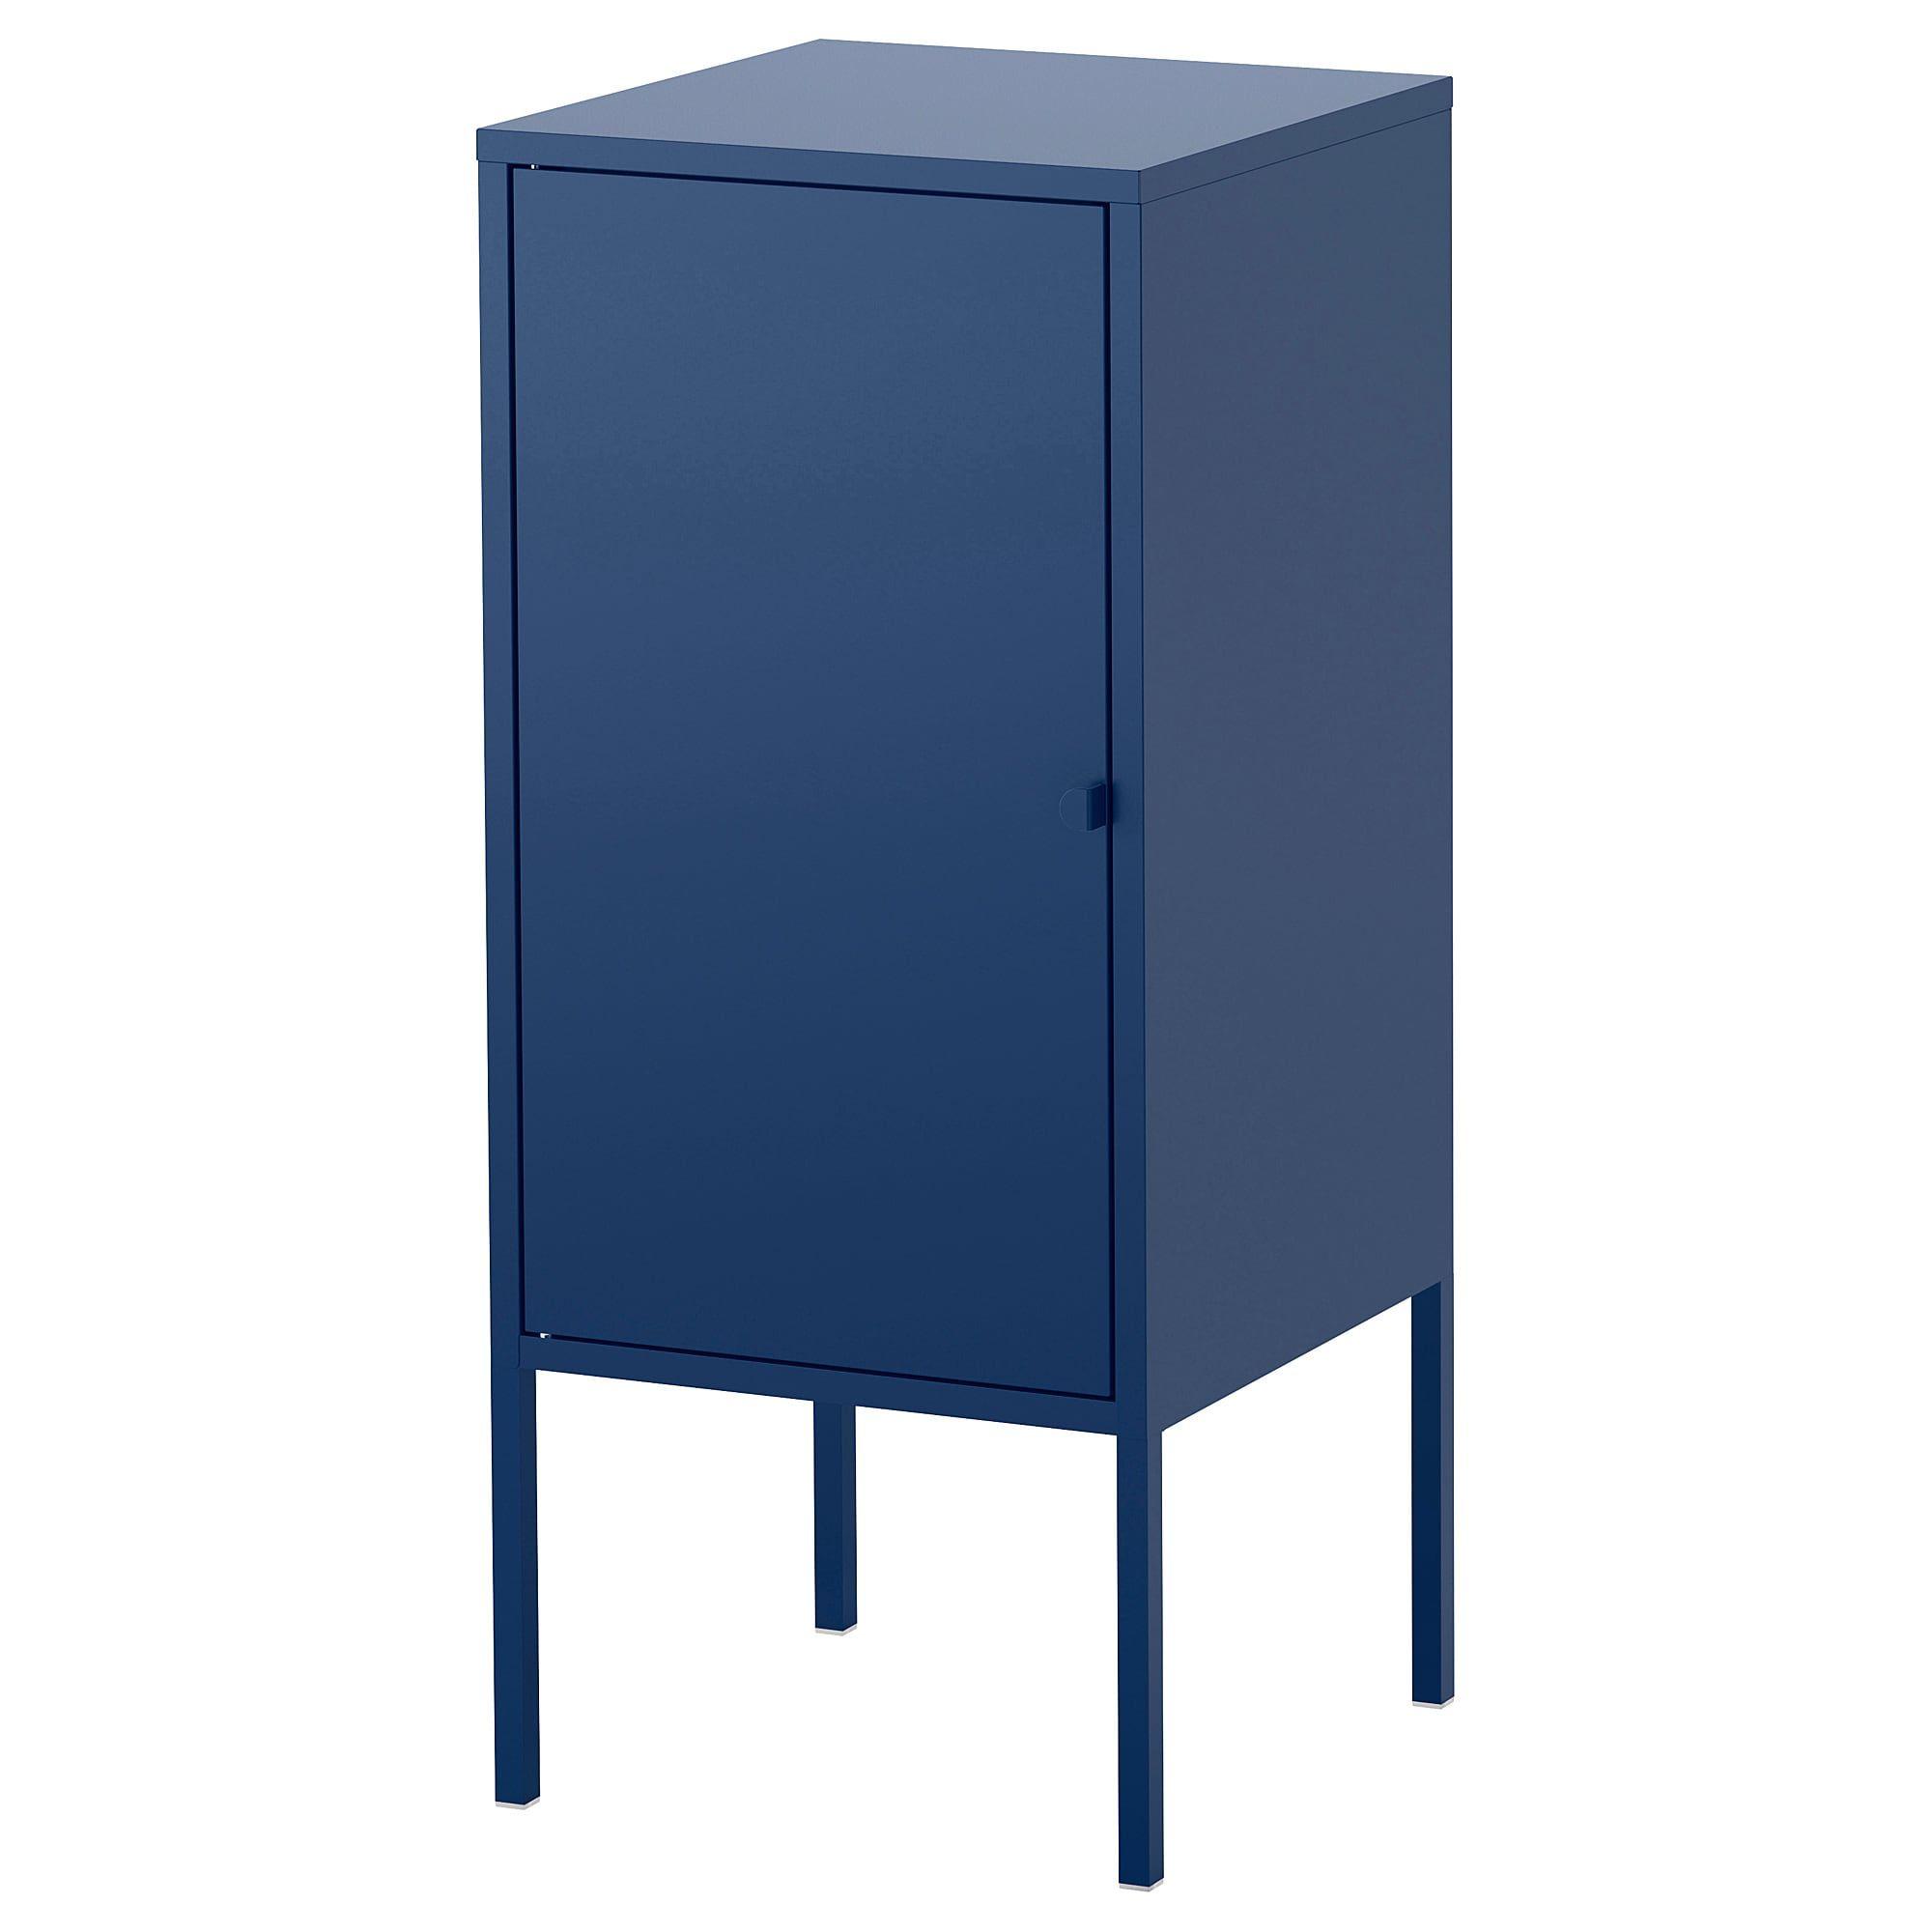 Ikea Lixhult Metal Dark Blue Cabinet In 2020 Ikea Shelving Unit Ikea Glass Cabinet Doors